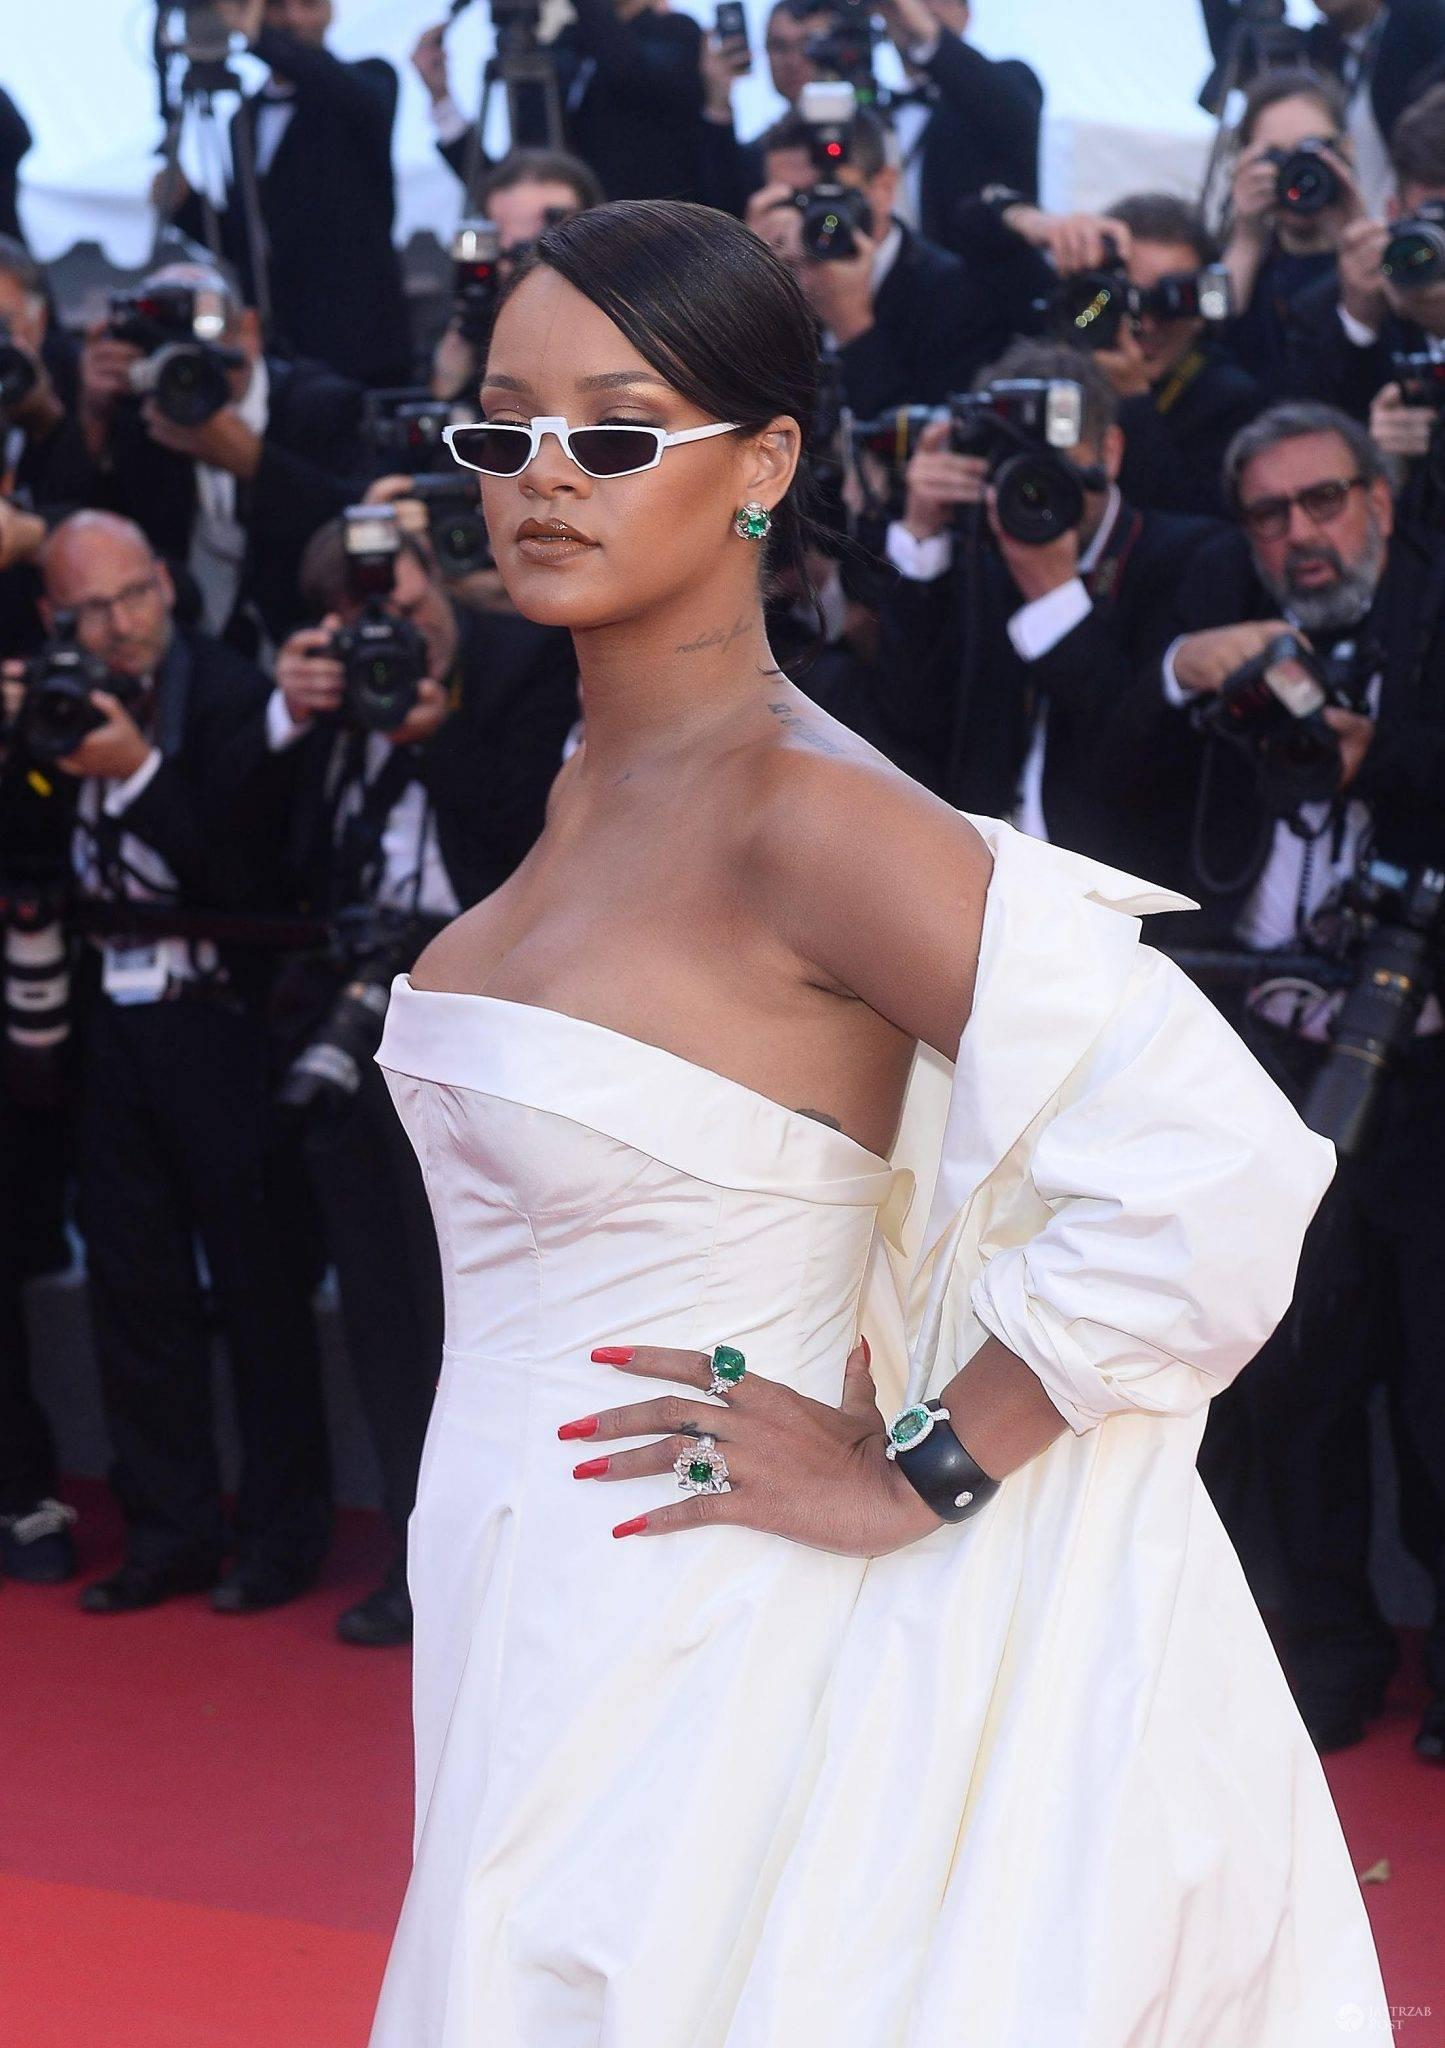 Rihanna w Cannes 2017, Okja